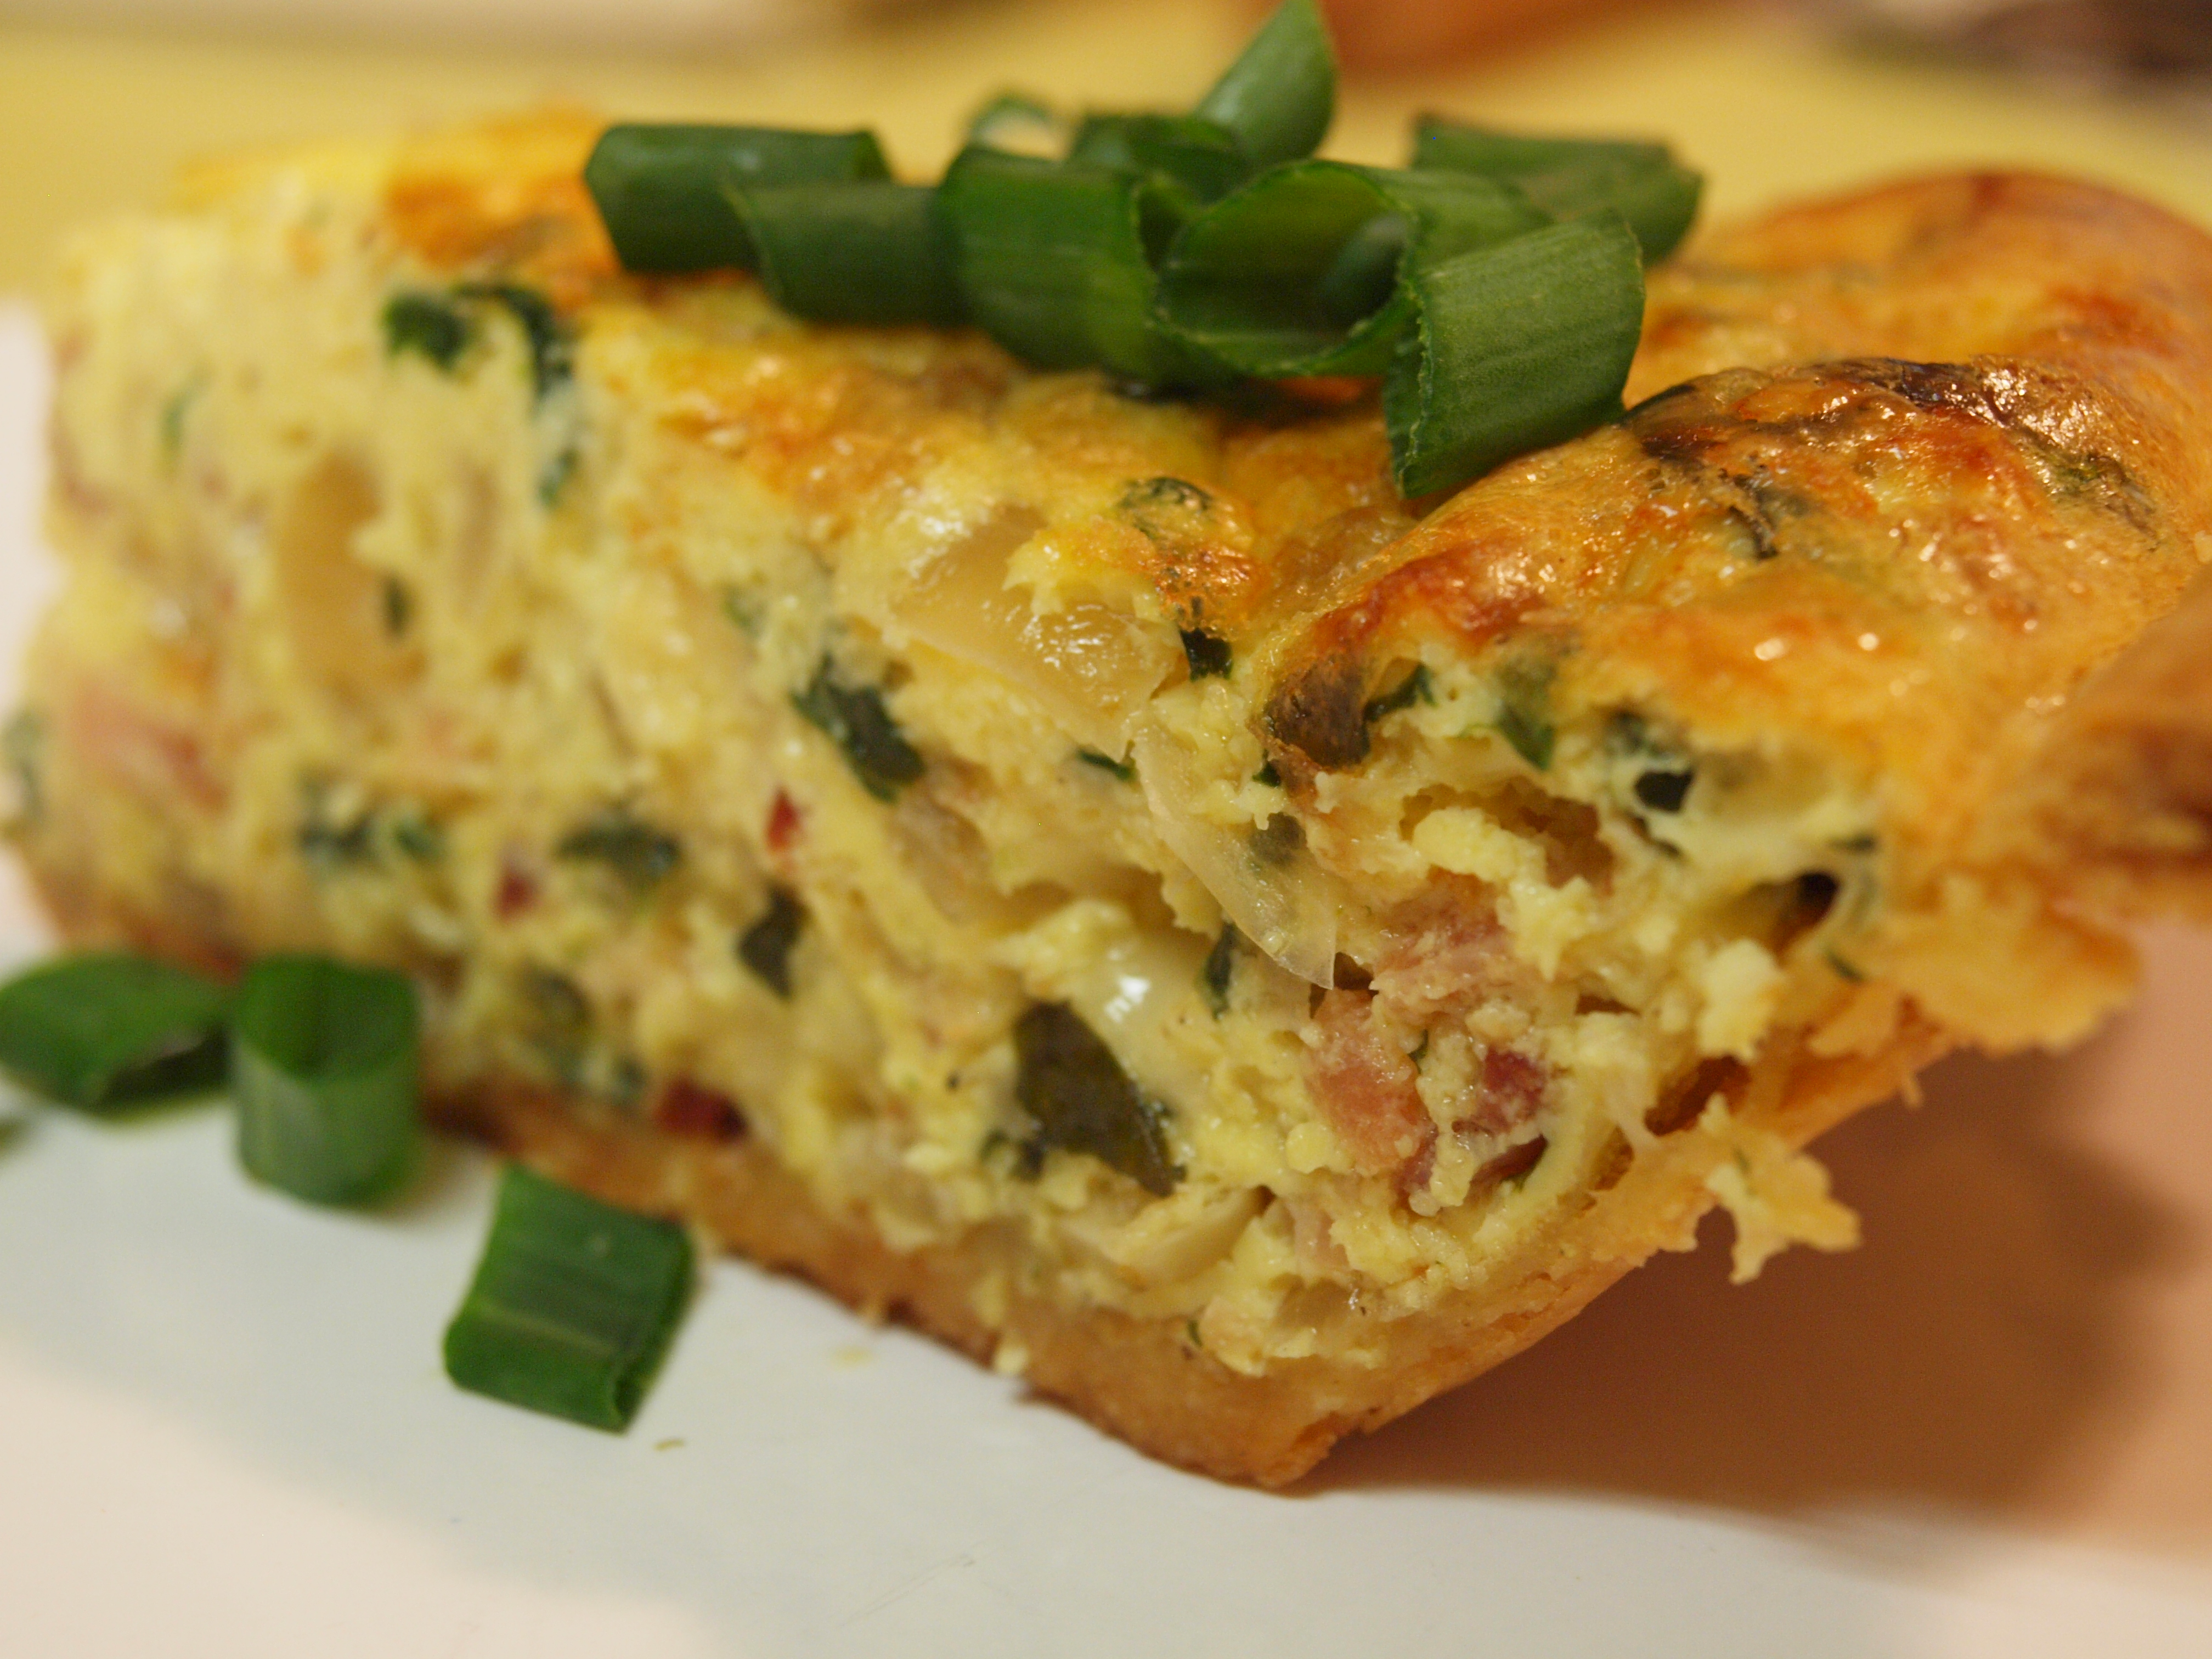 Amazing brunch recipe basil spinach quiche lorraine for Good quiche recipes easy